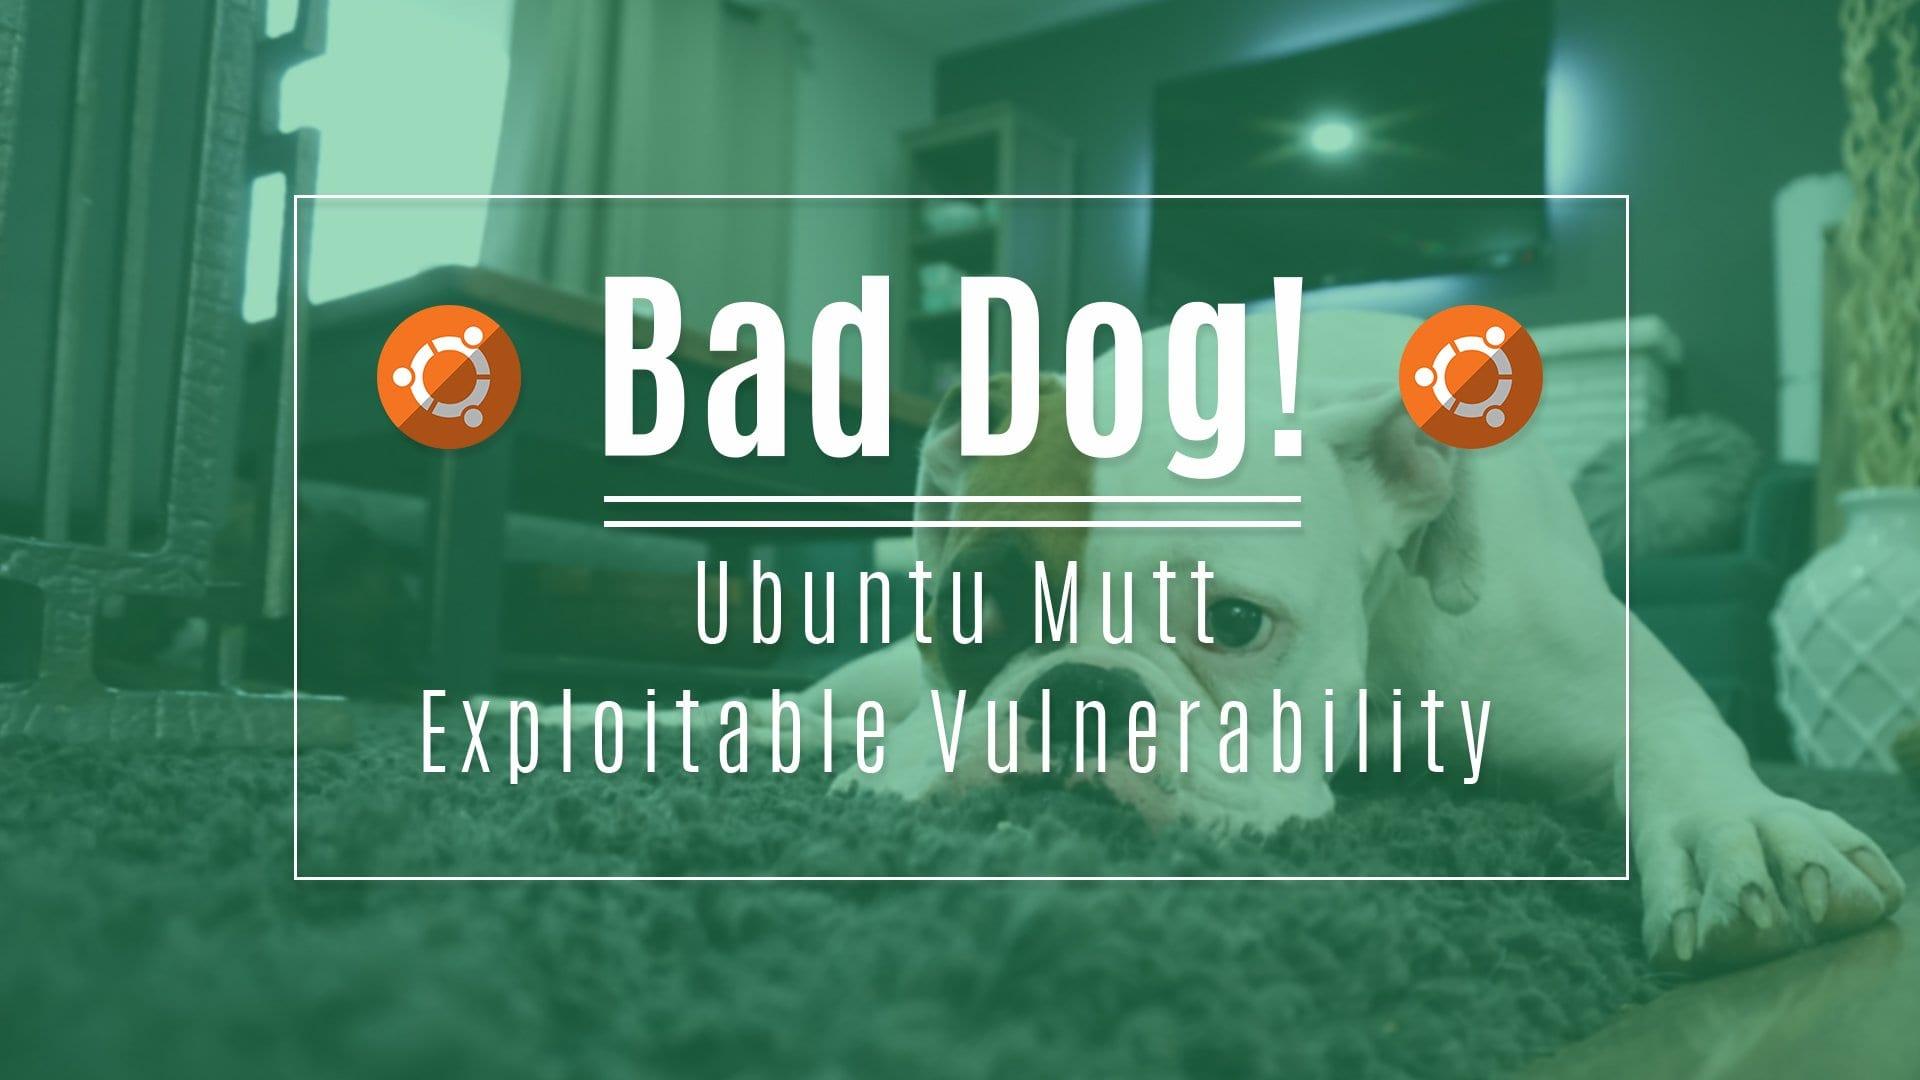 Bad Dog! Ubuntu Mutt Exploitable Vulnerability